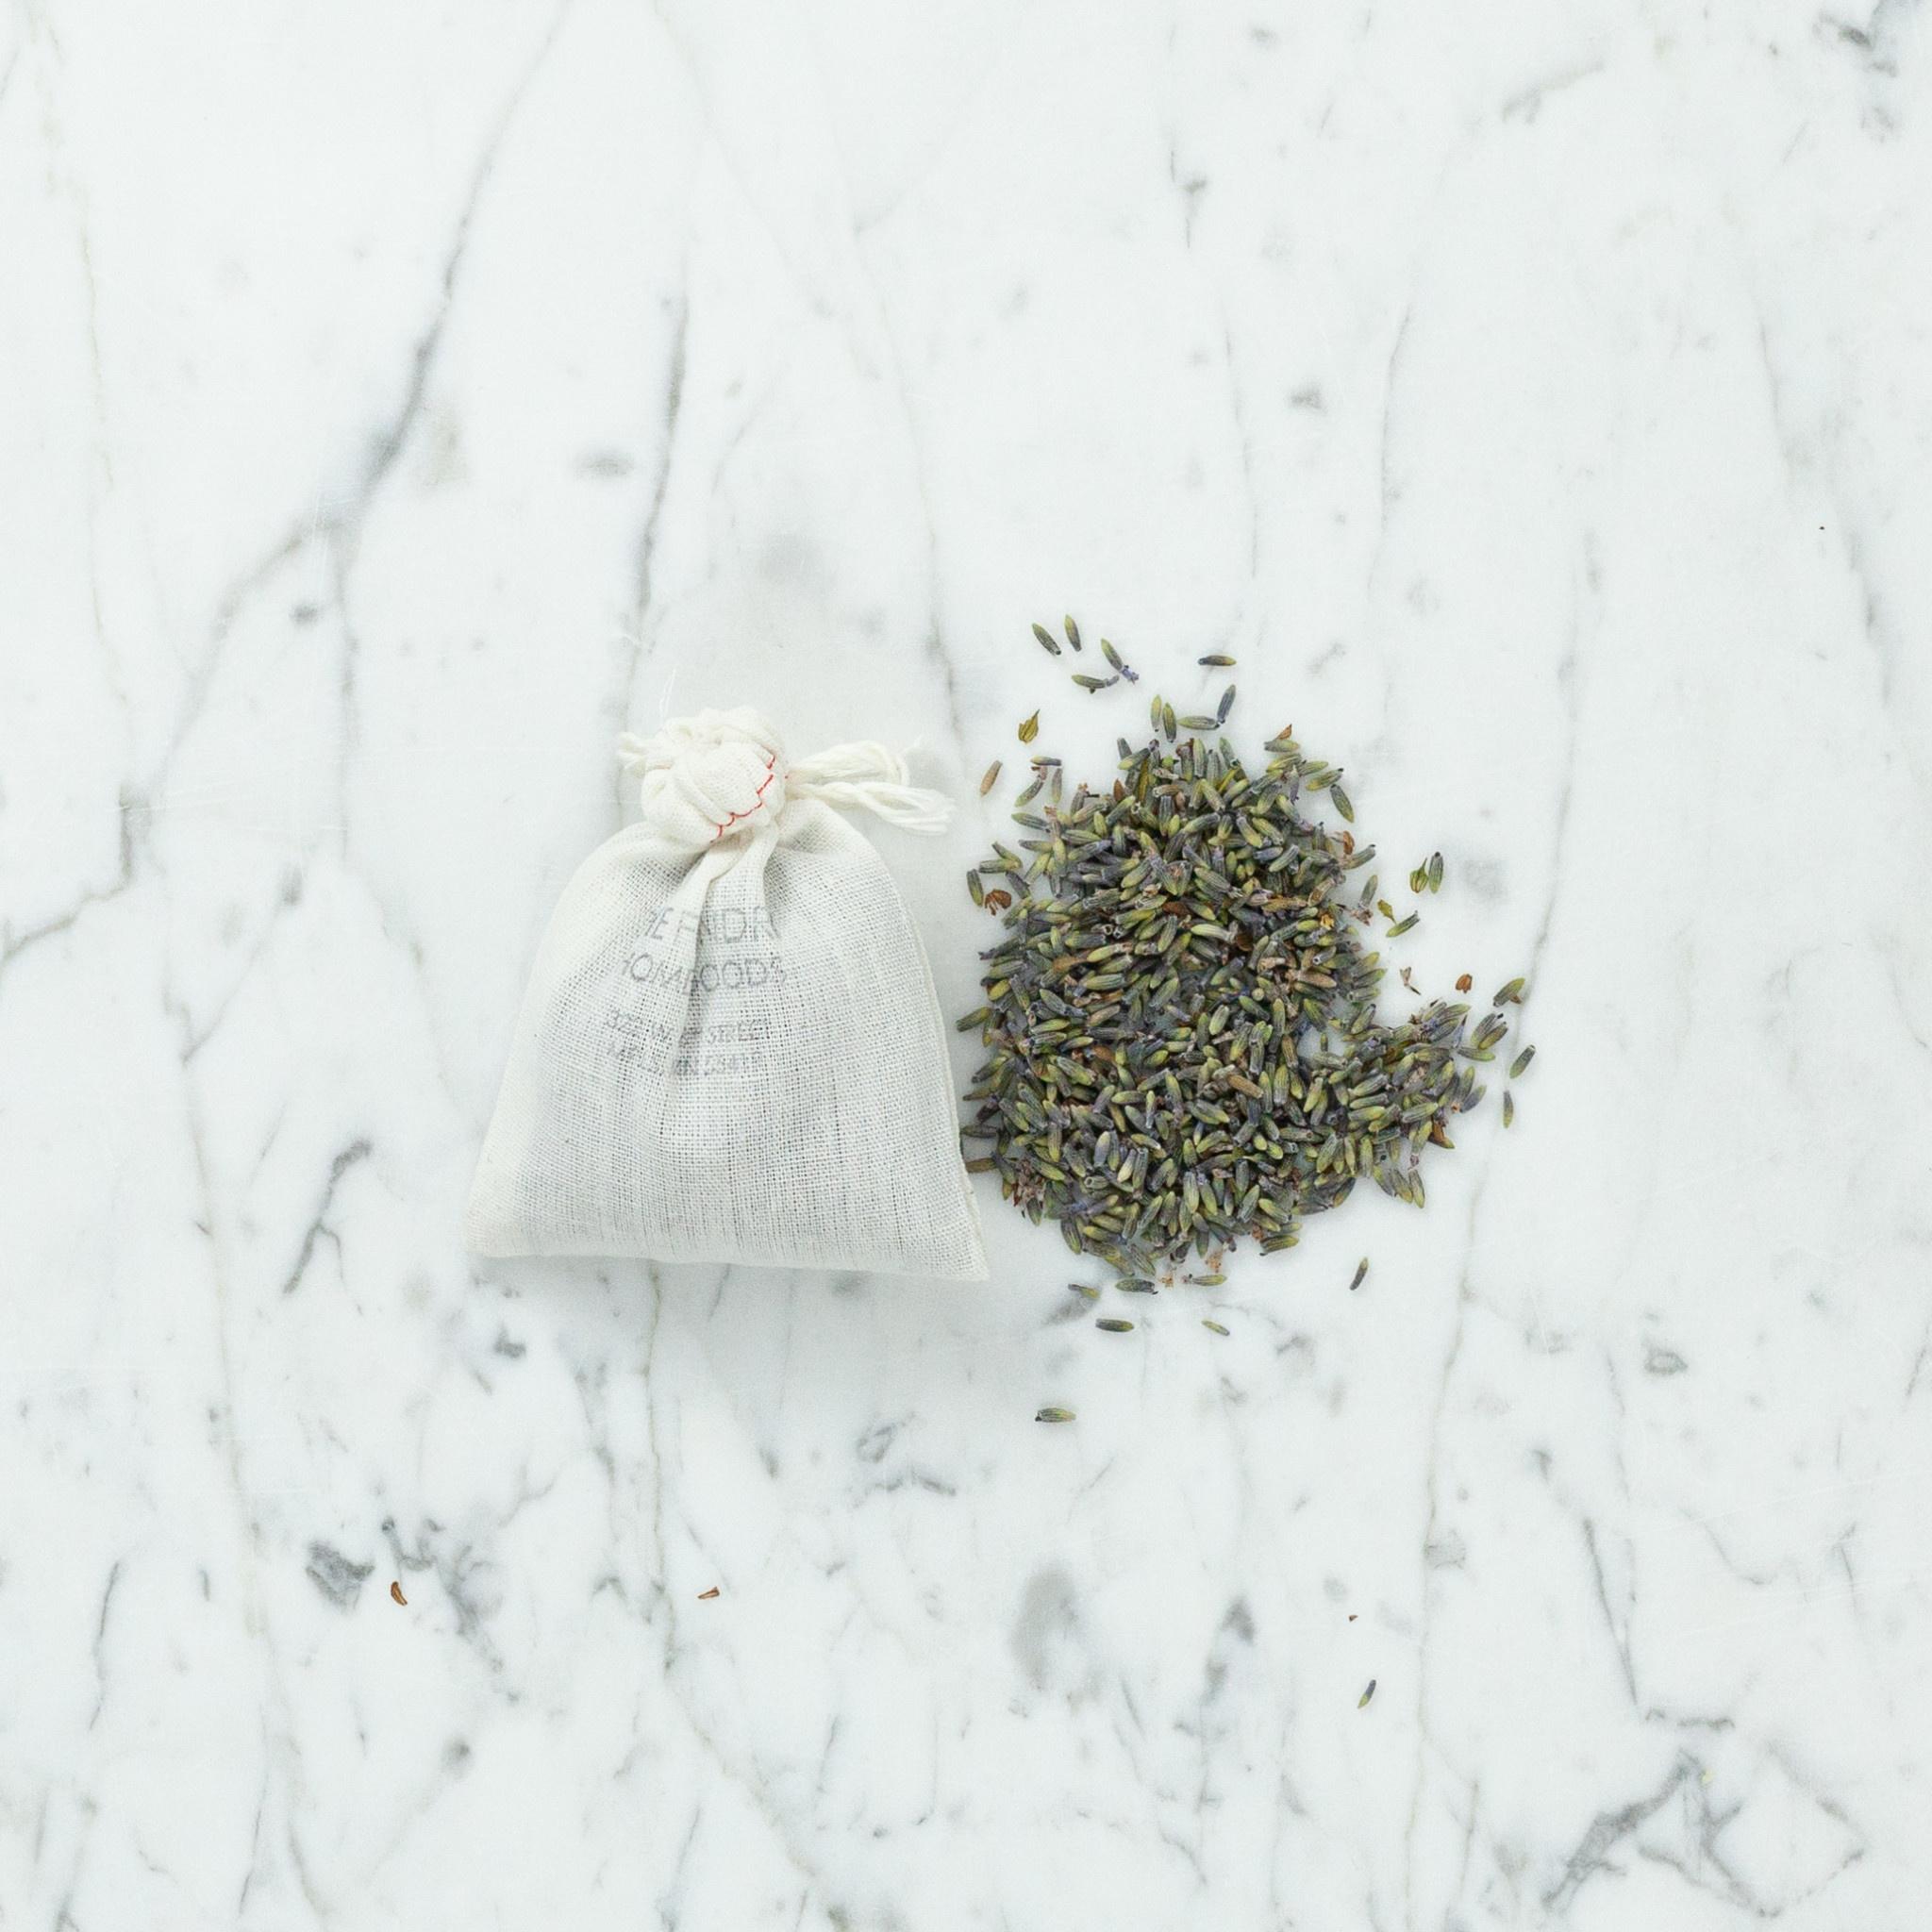 Lavender Buds in a Muslin Bag - 3.5 oz